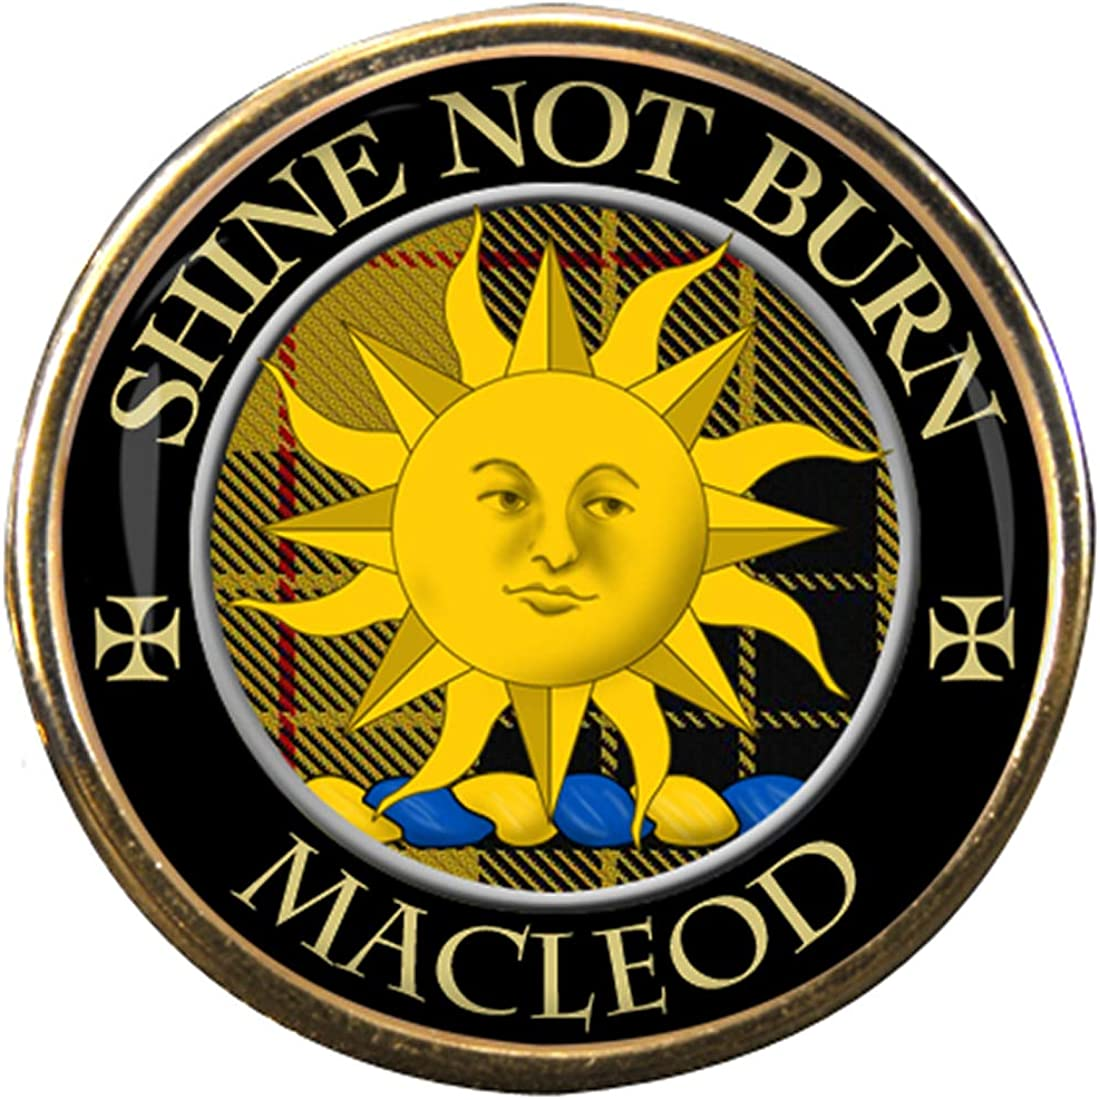 Macleod Scottish Clan Crest Lapel Pin Badge